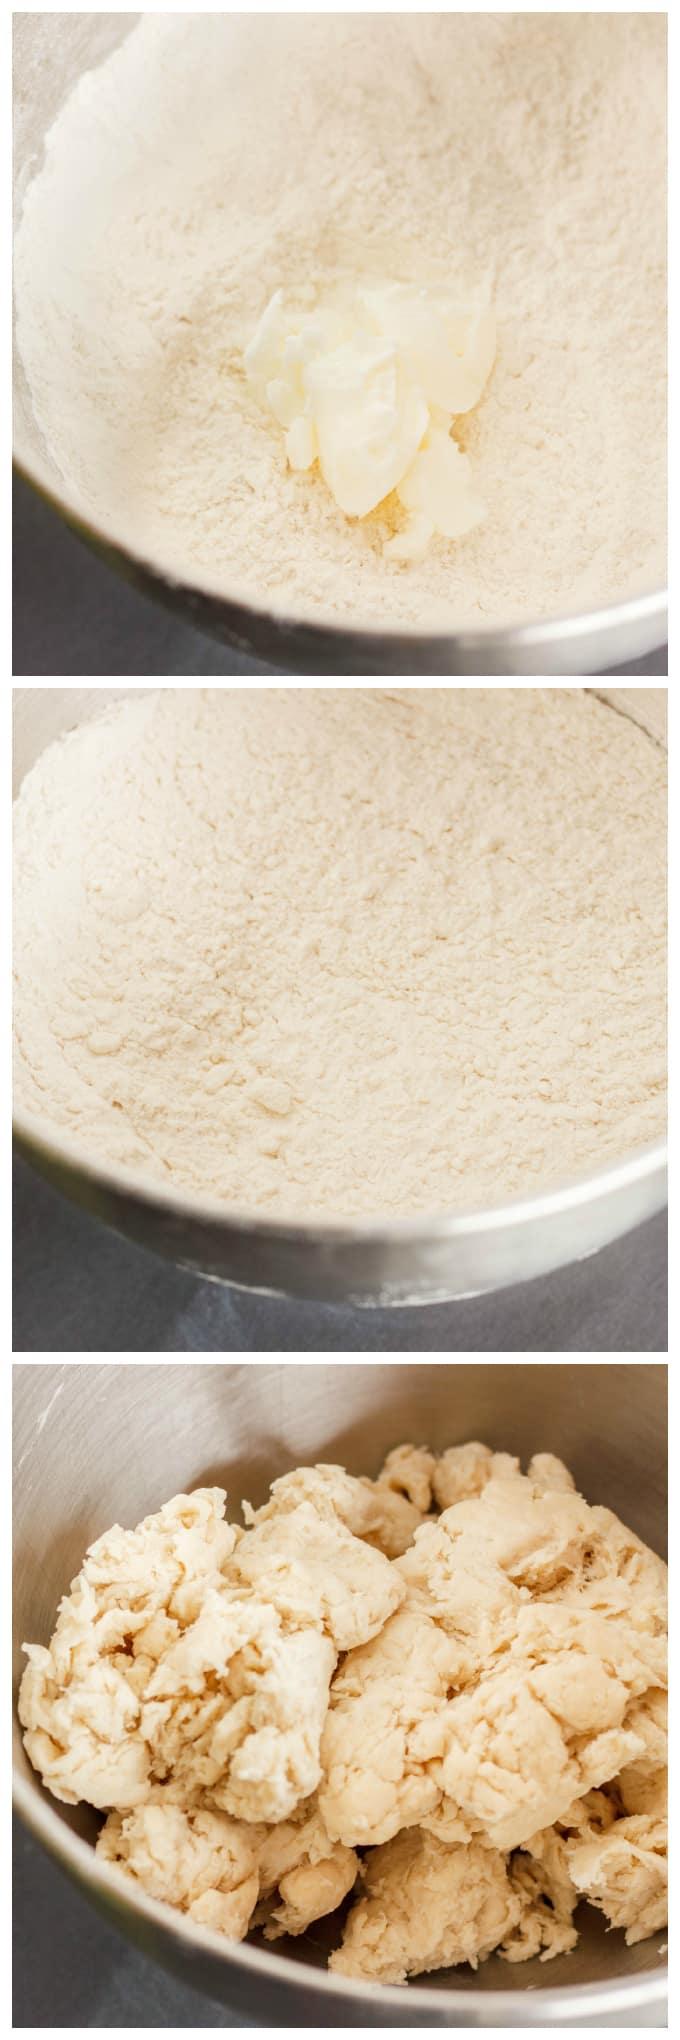 Homemade Flour Tortillas 2